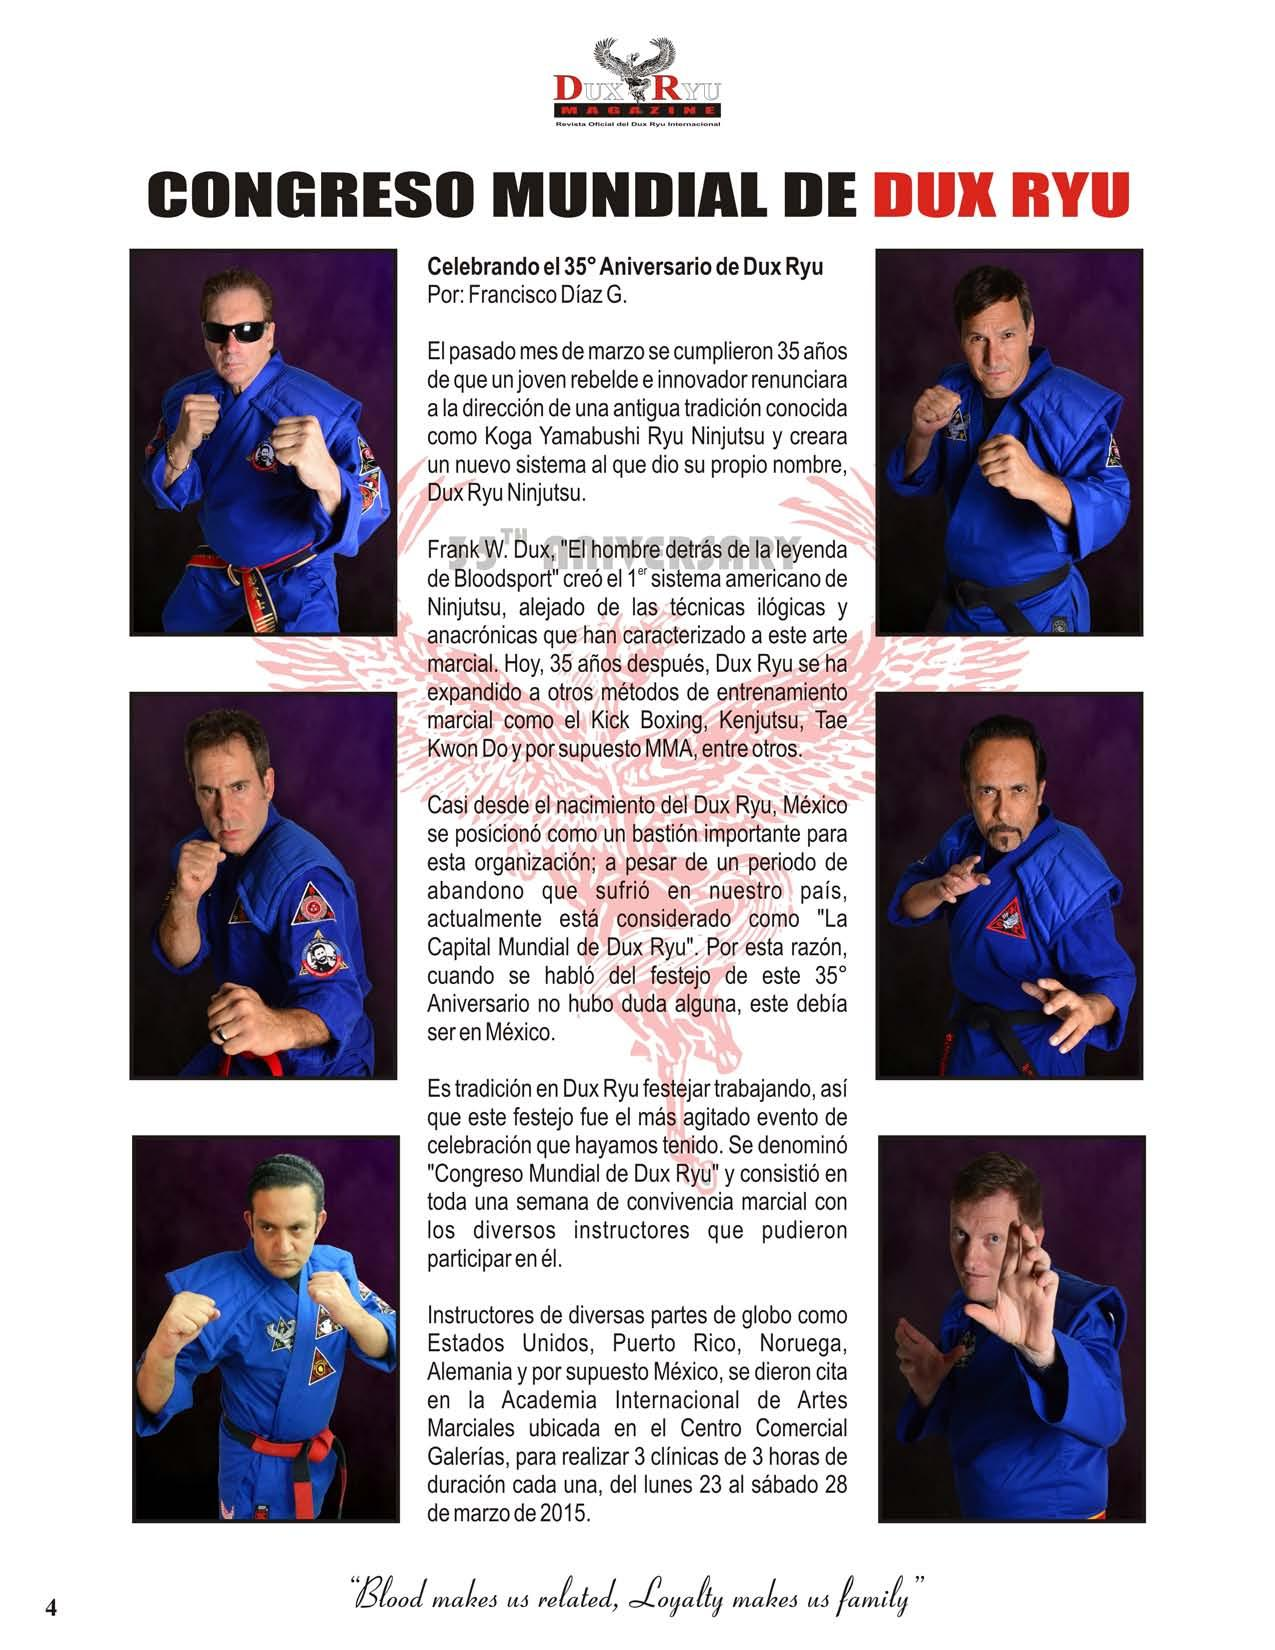 dux-ryu-magazine-08-page-005